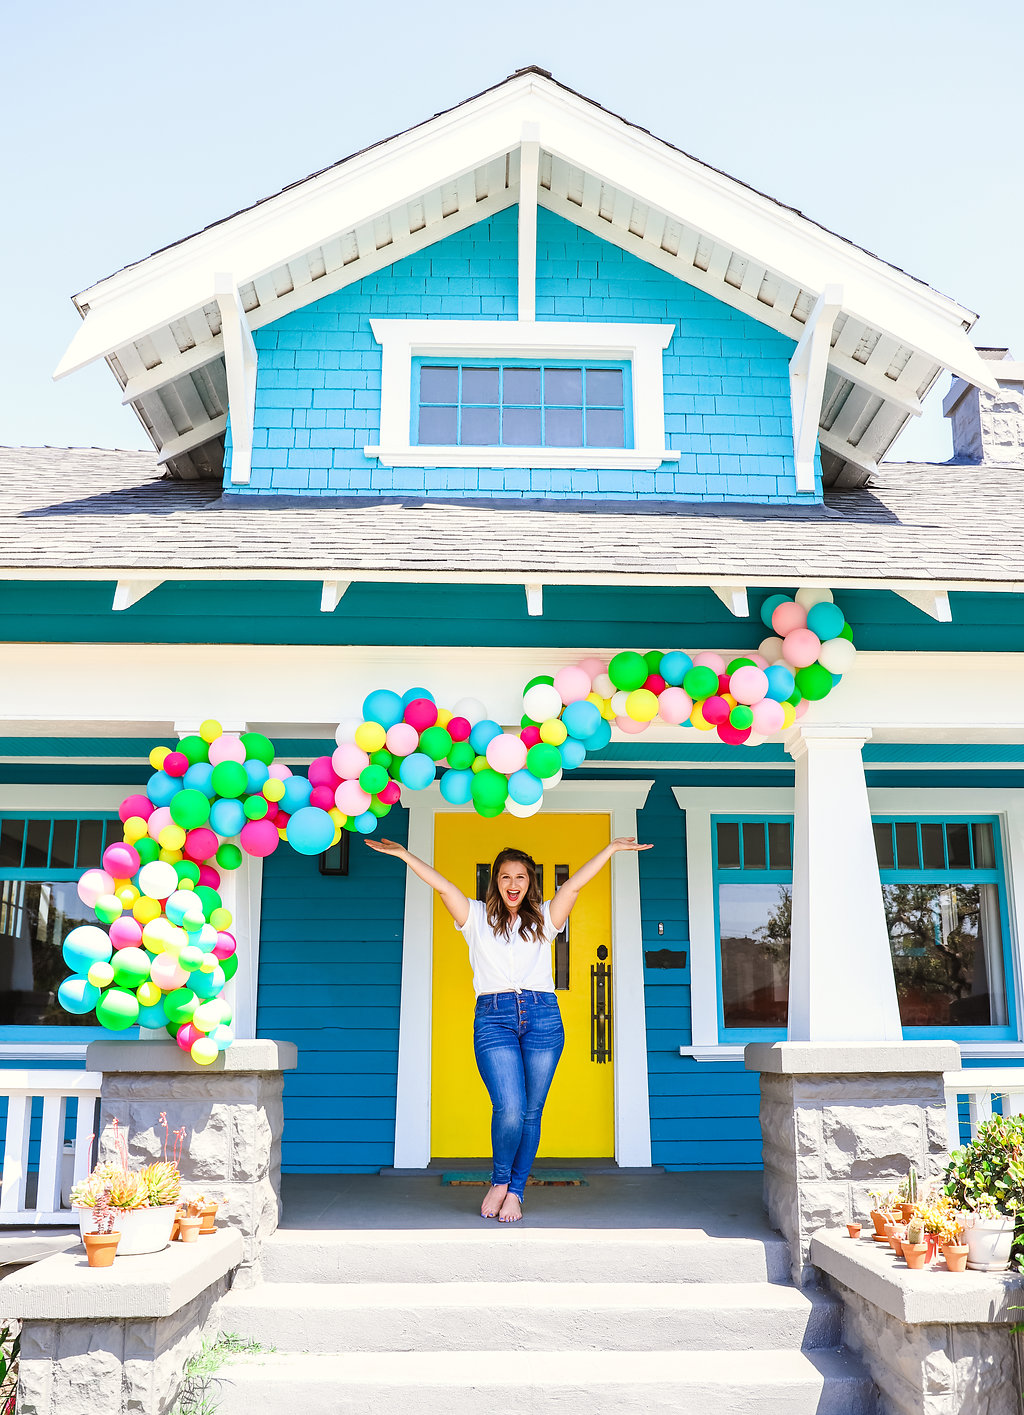 julianna strickland blue house balloons